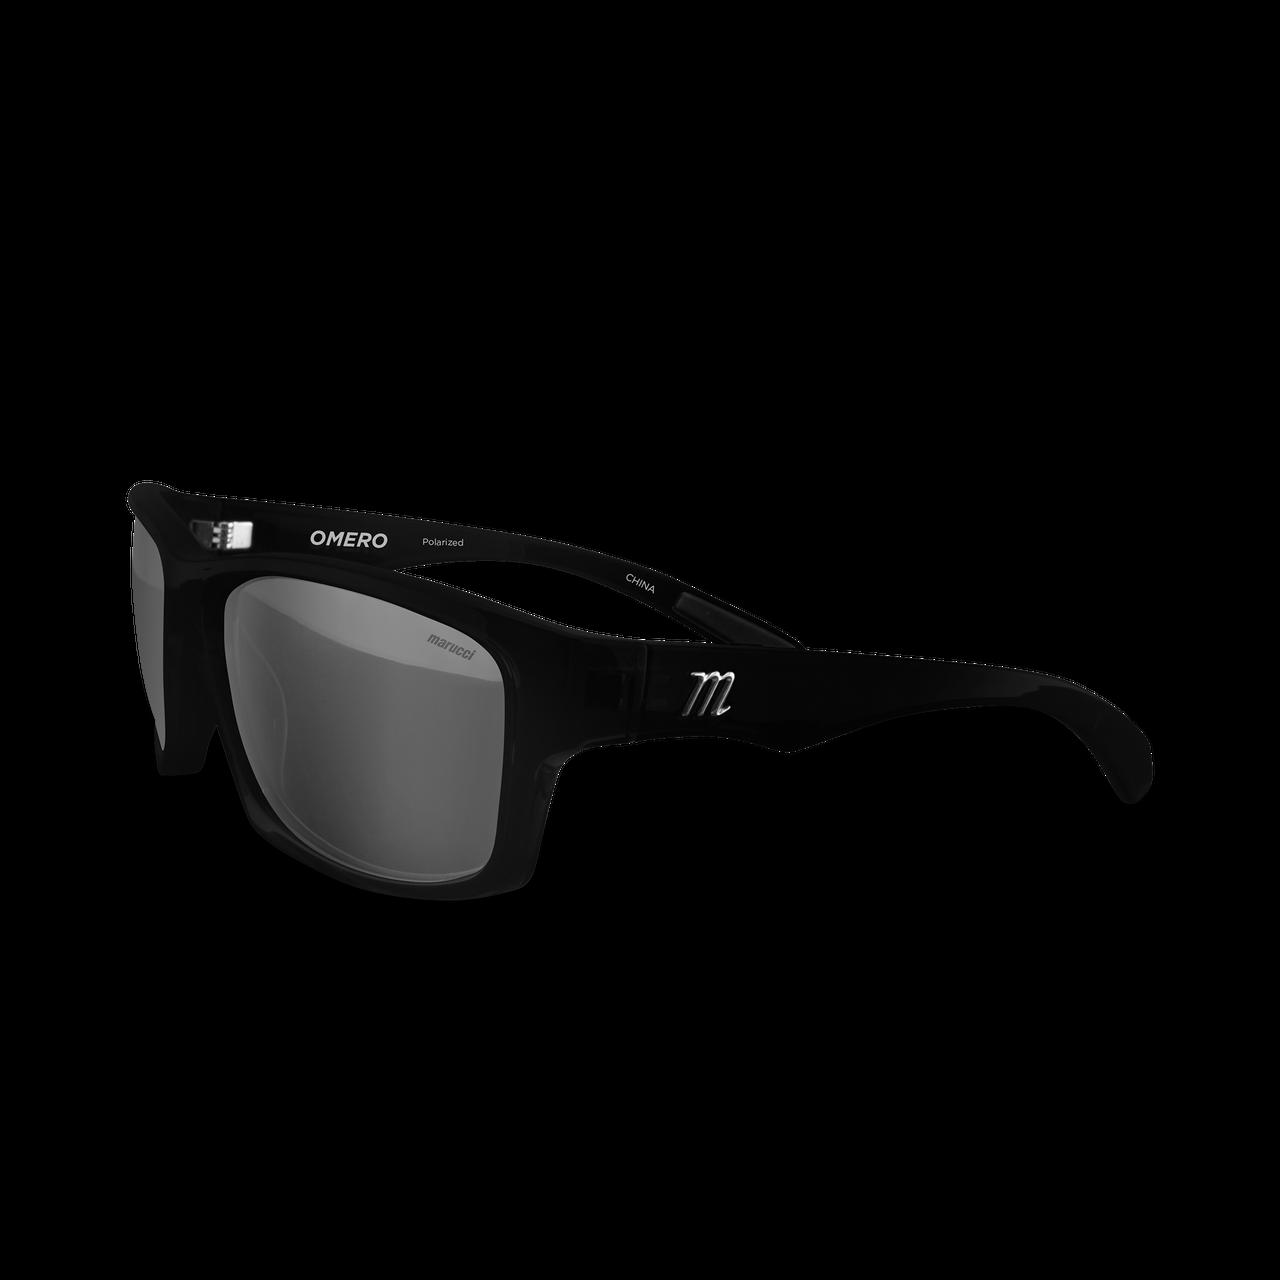 a16a4d6c584c4 Omero Lifestyle Sunglasses - Marucci Sports